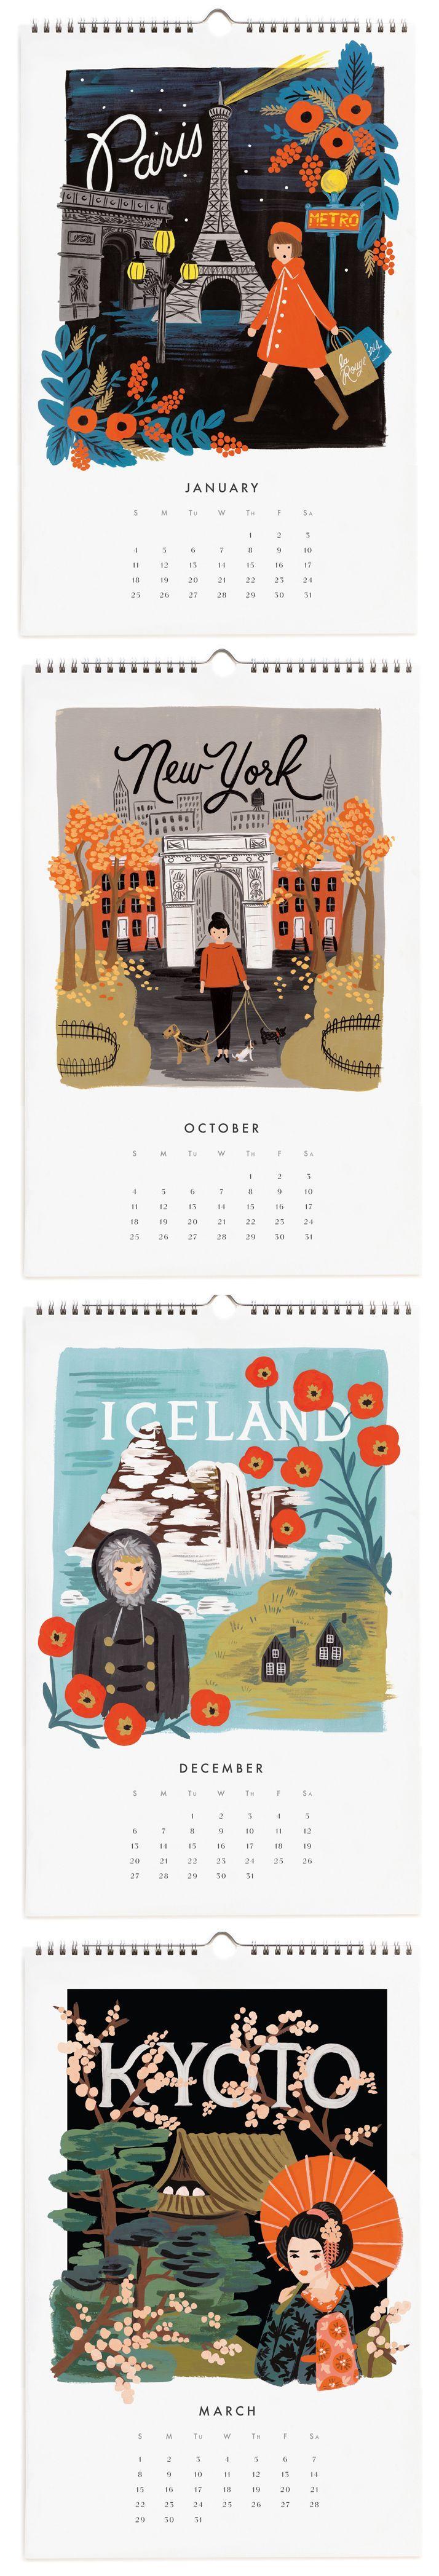 Rifle Paper Co / Calendar Pages